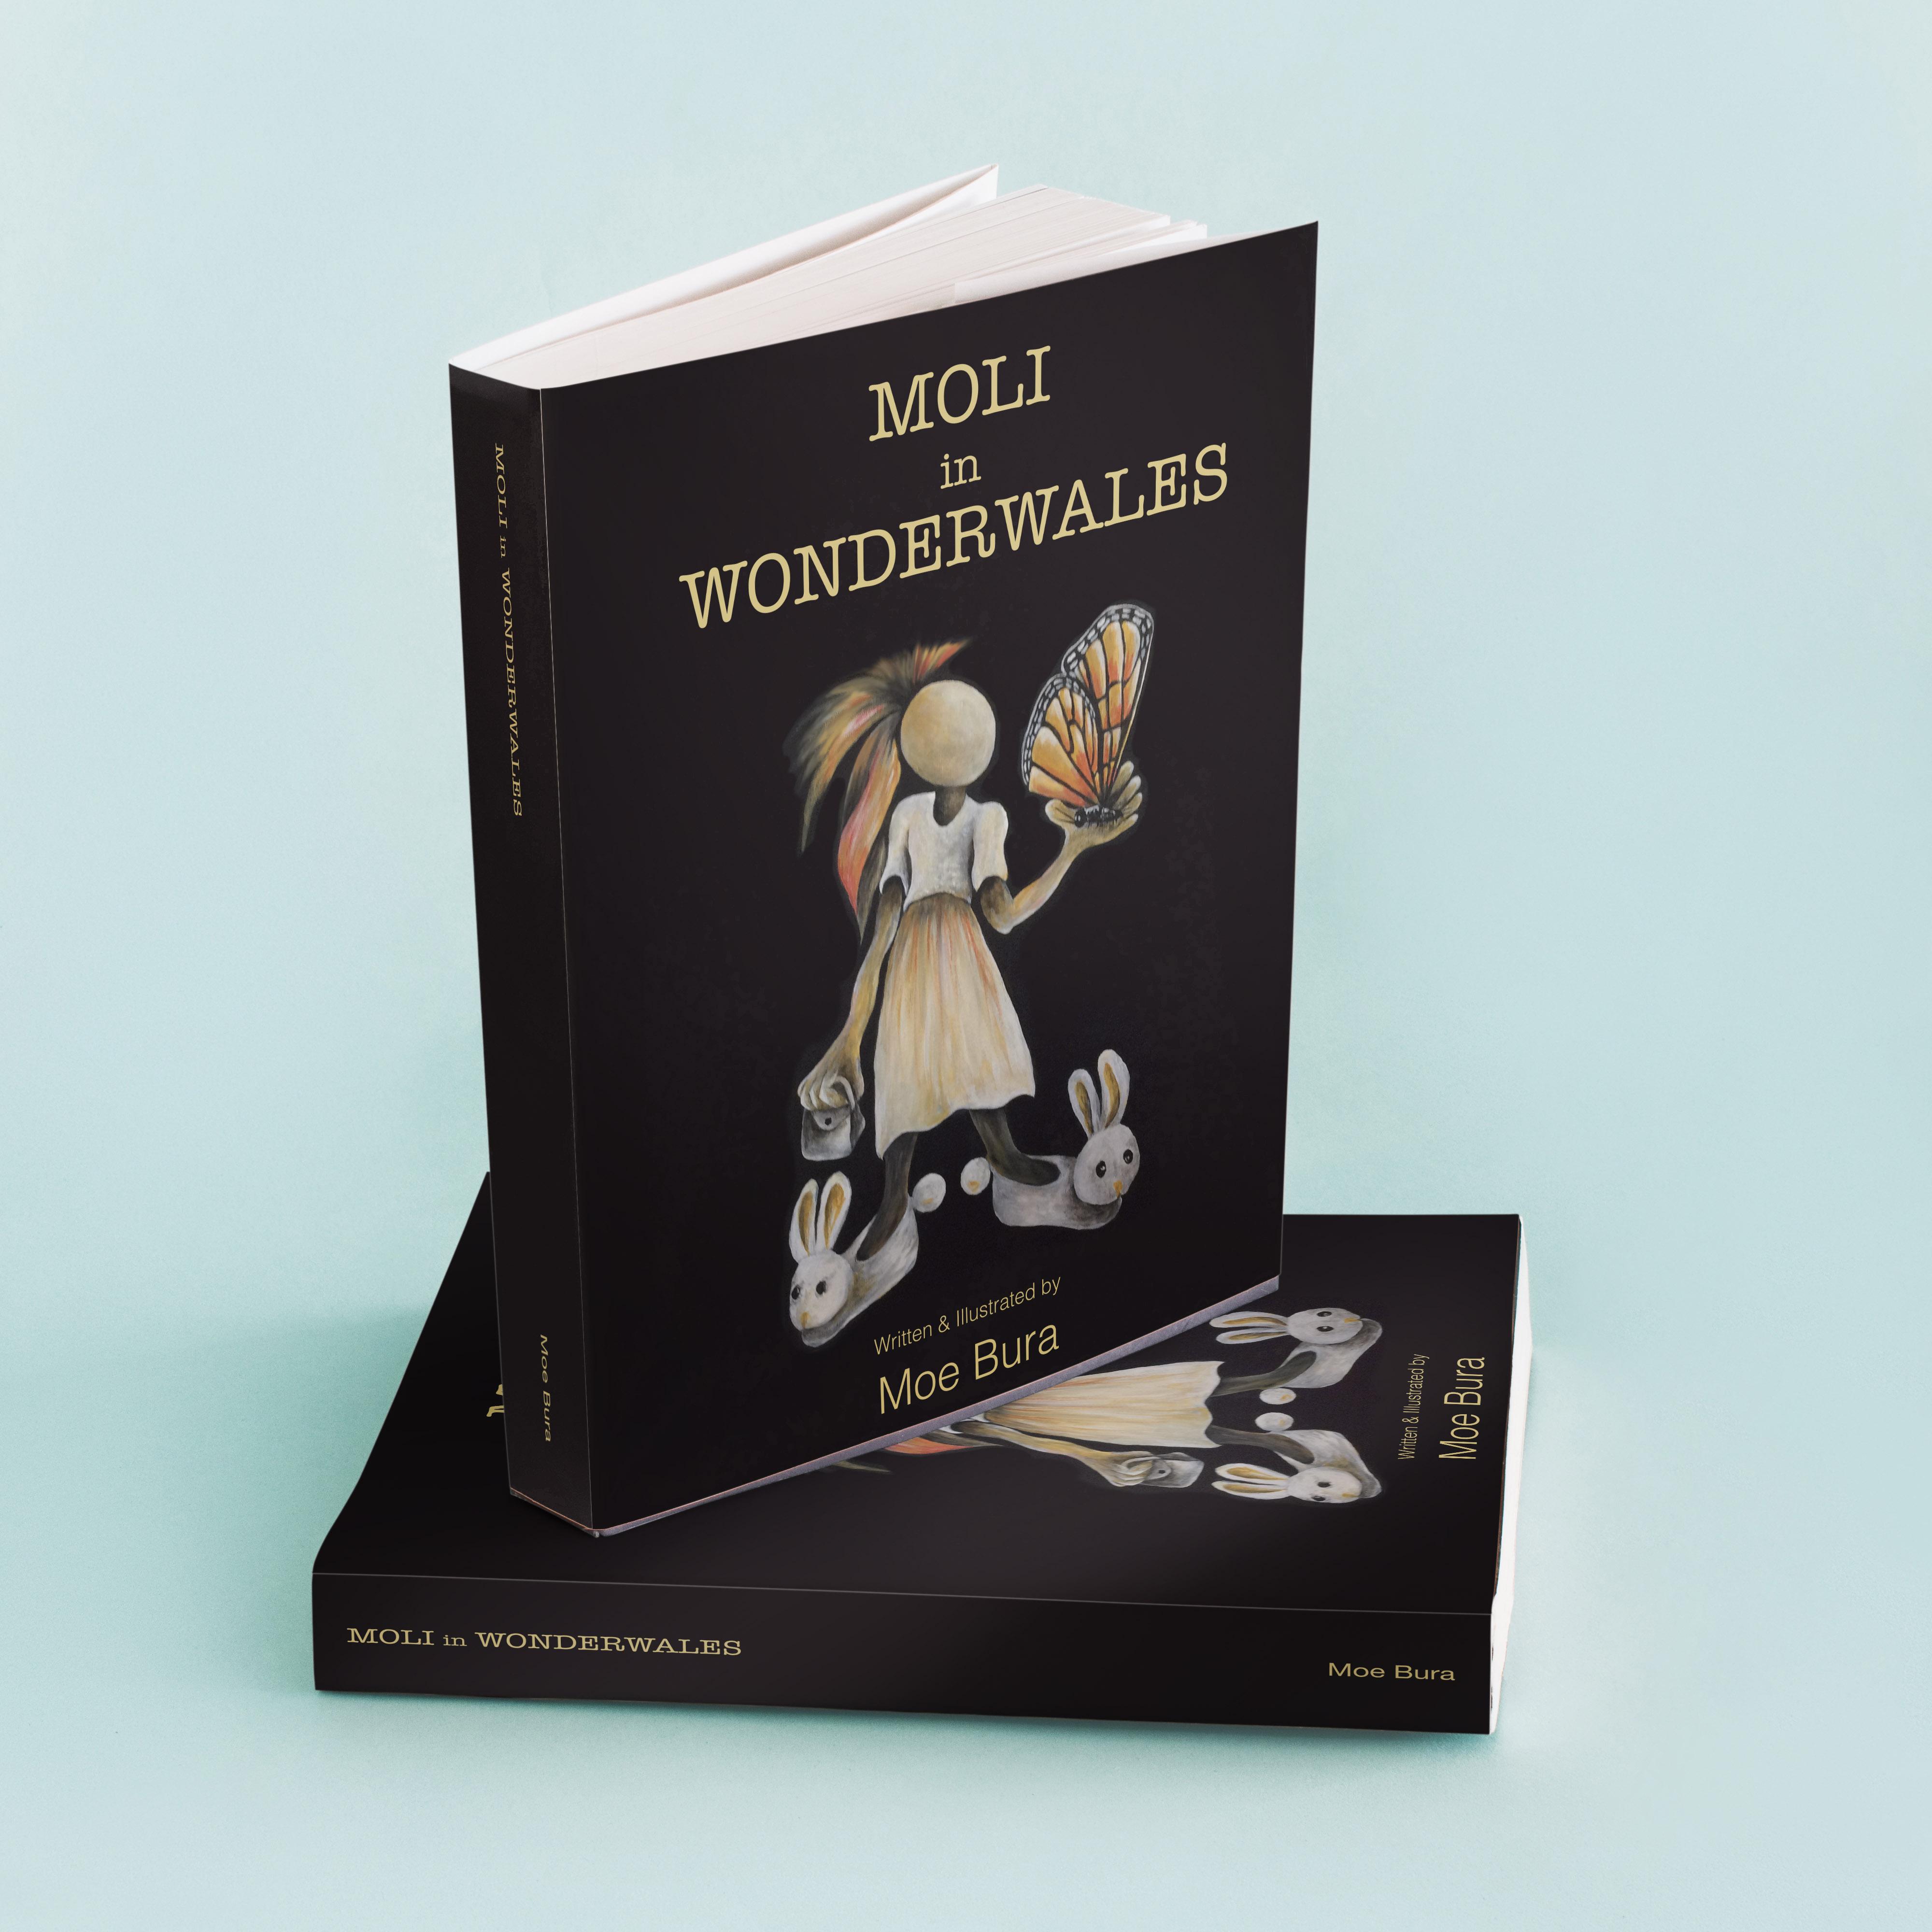 moli wonderwales